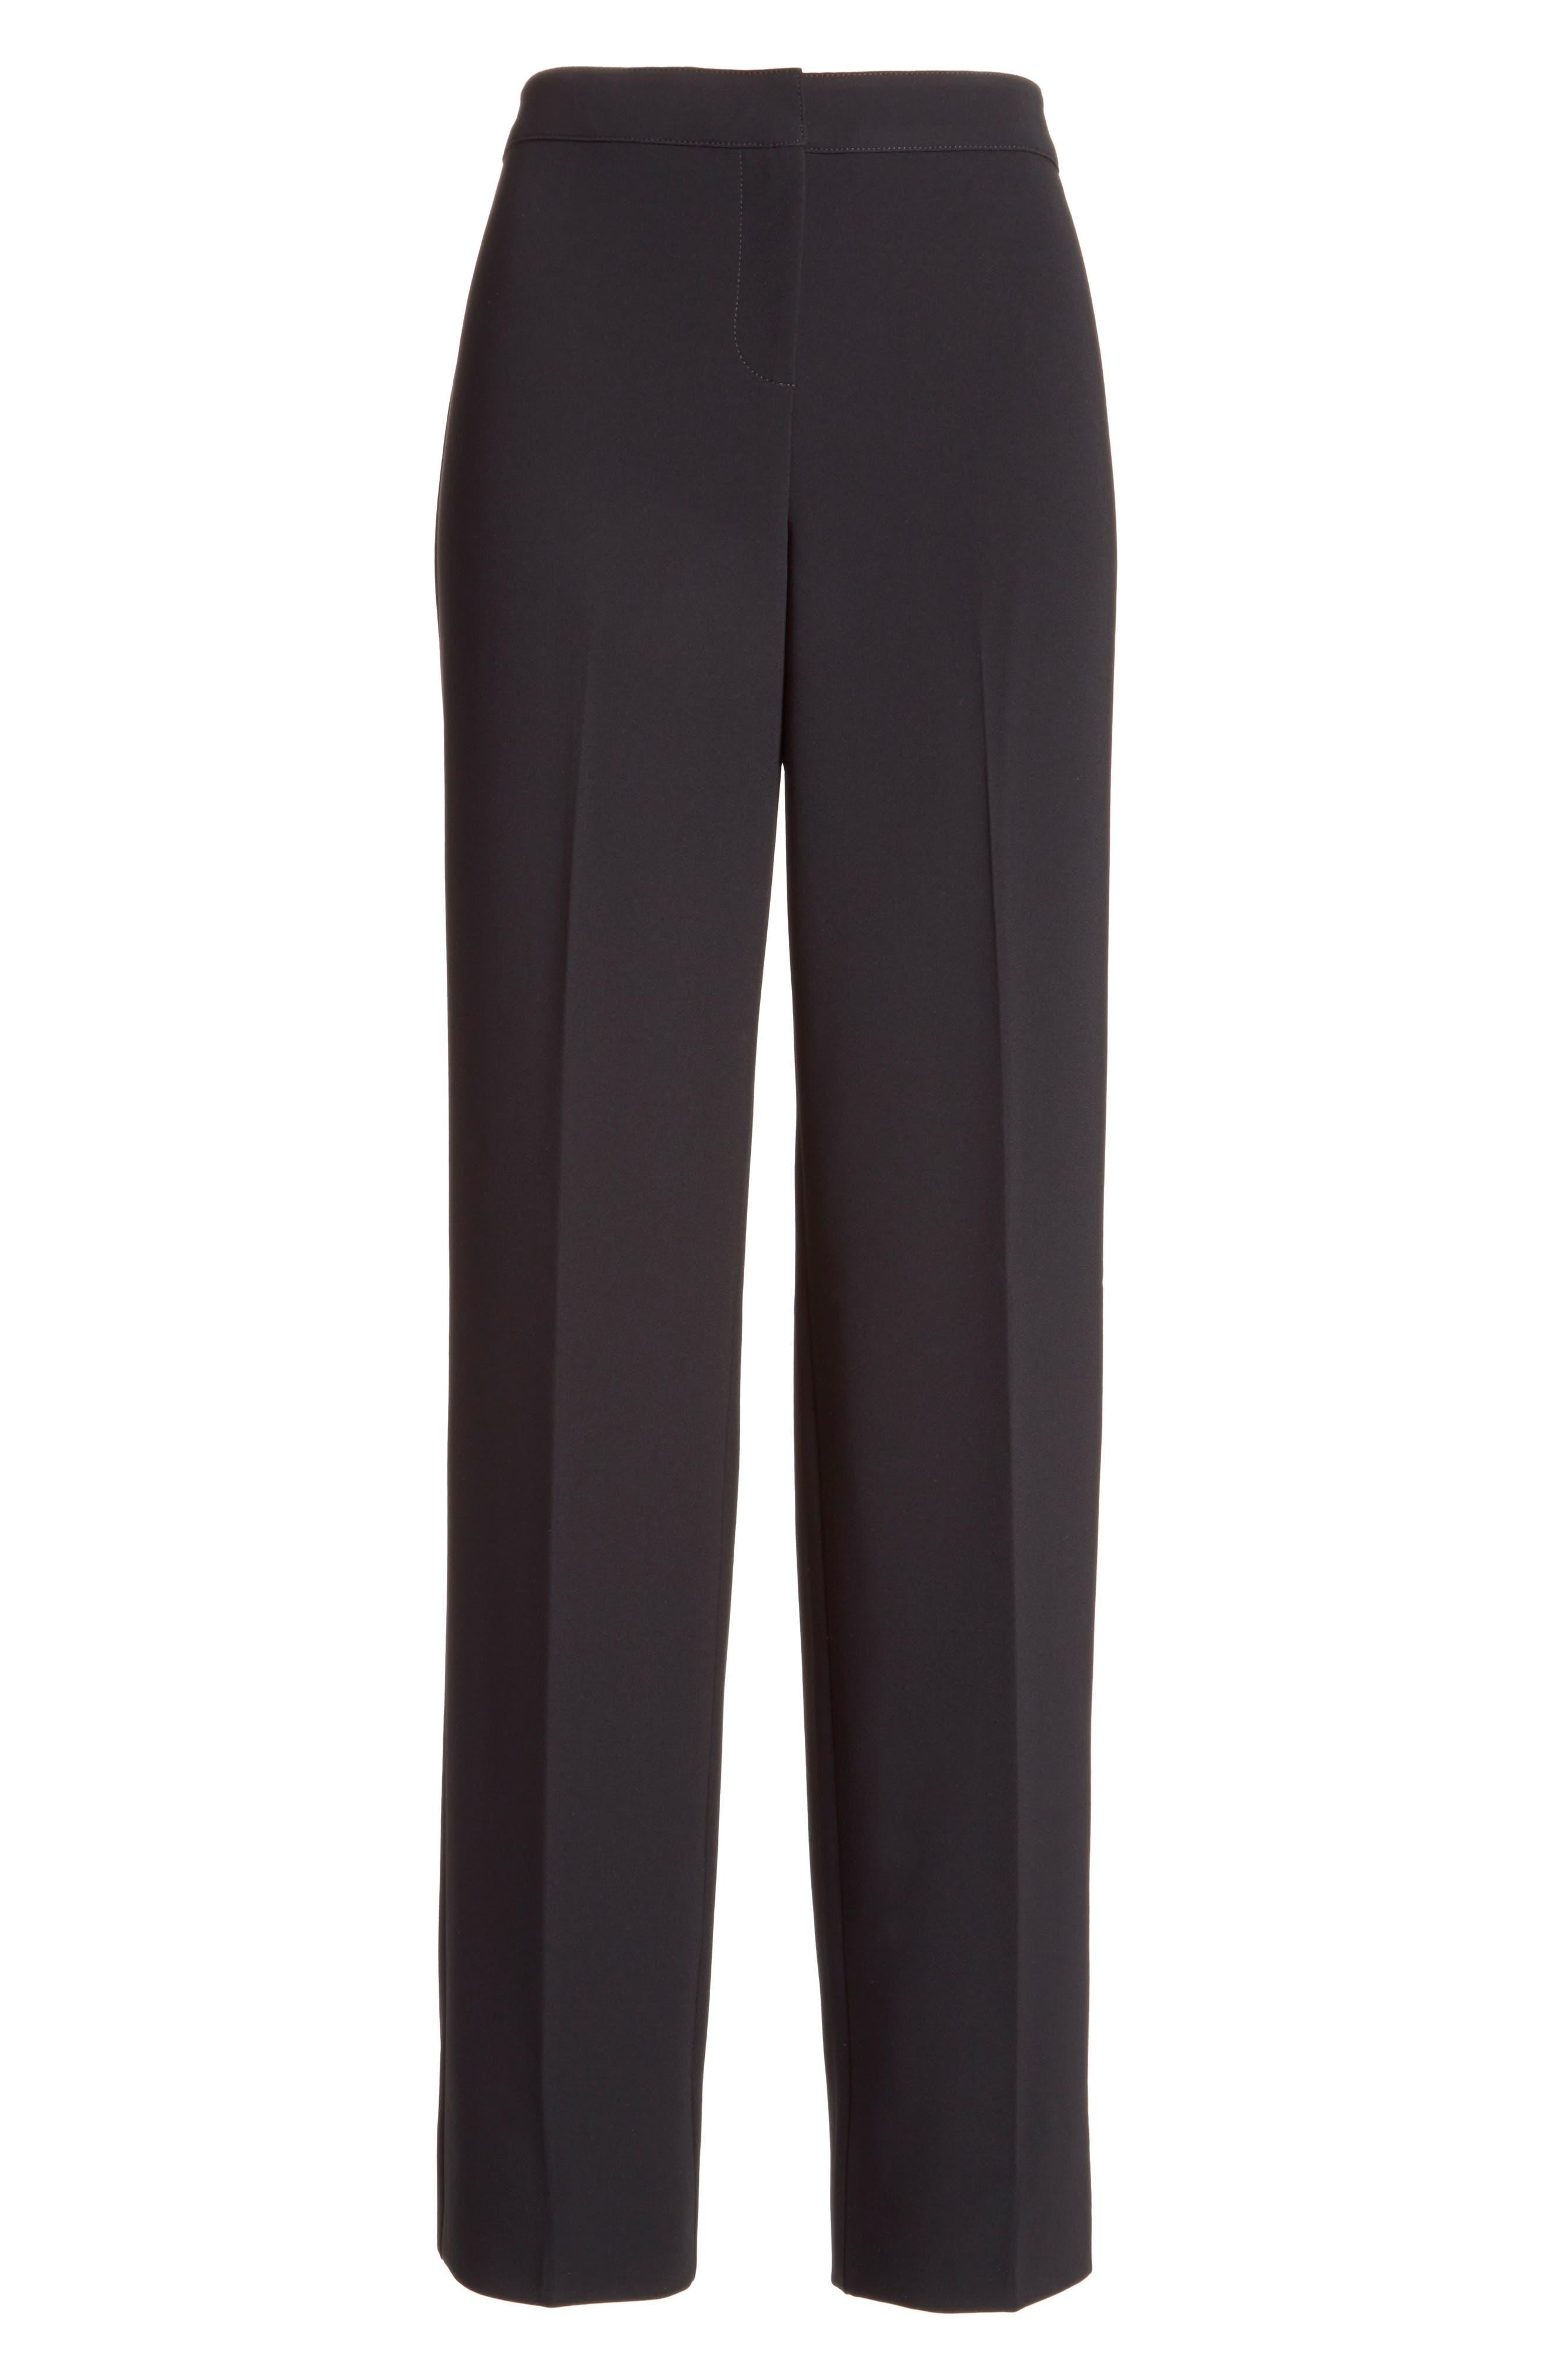 Diana Straight Leg Crepe Marocain Pants,                             Alternate thumbnail 7, color,                             CAVIAR